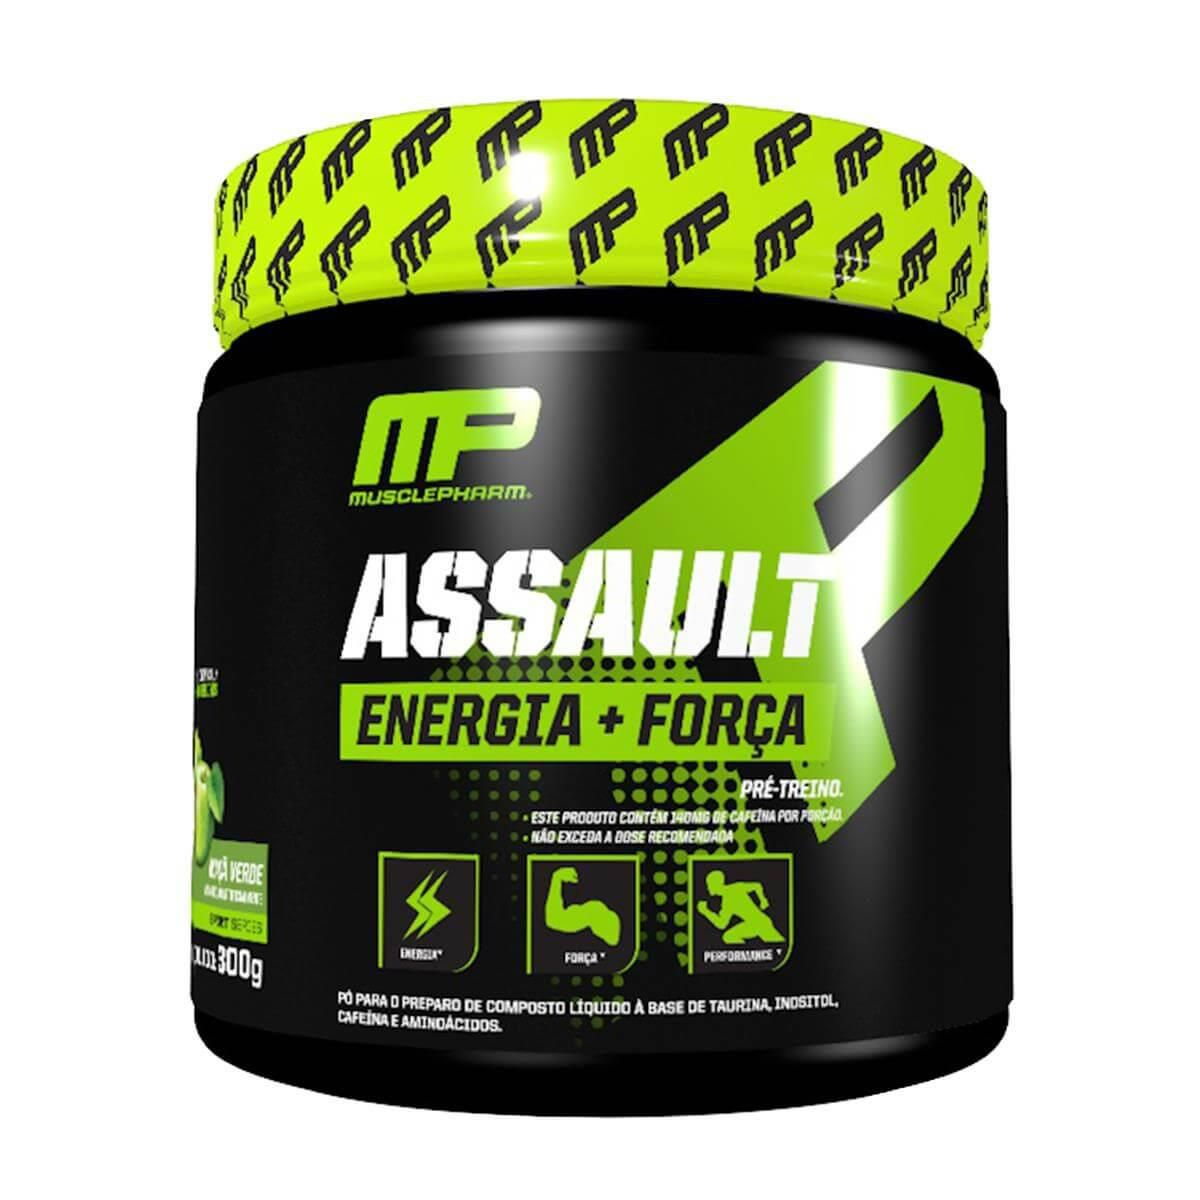 Assault - Muscle Pharm